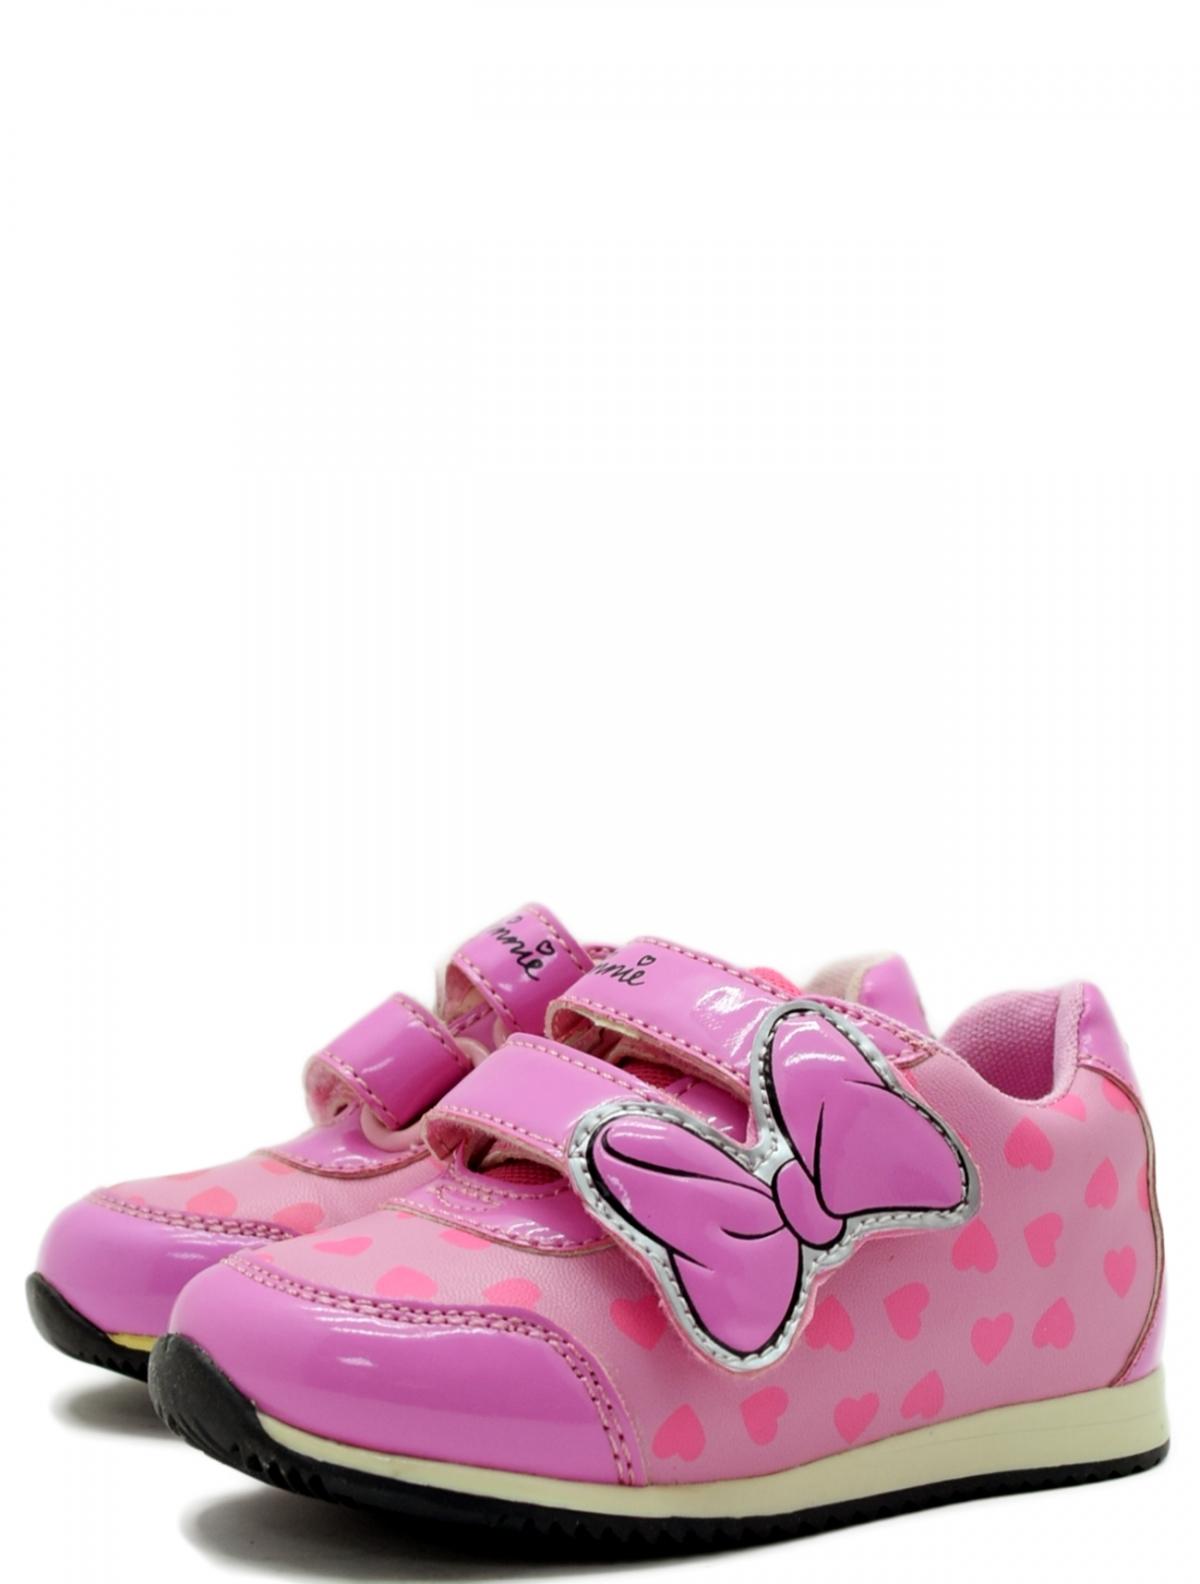 DM002249 кроссовки для девочки